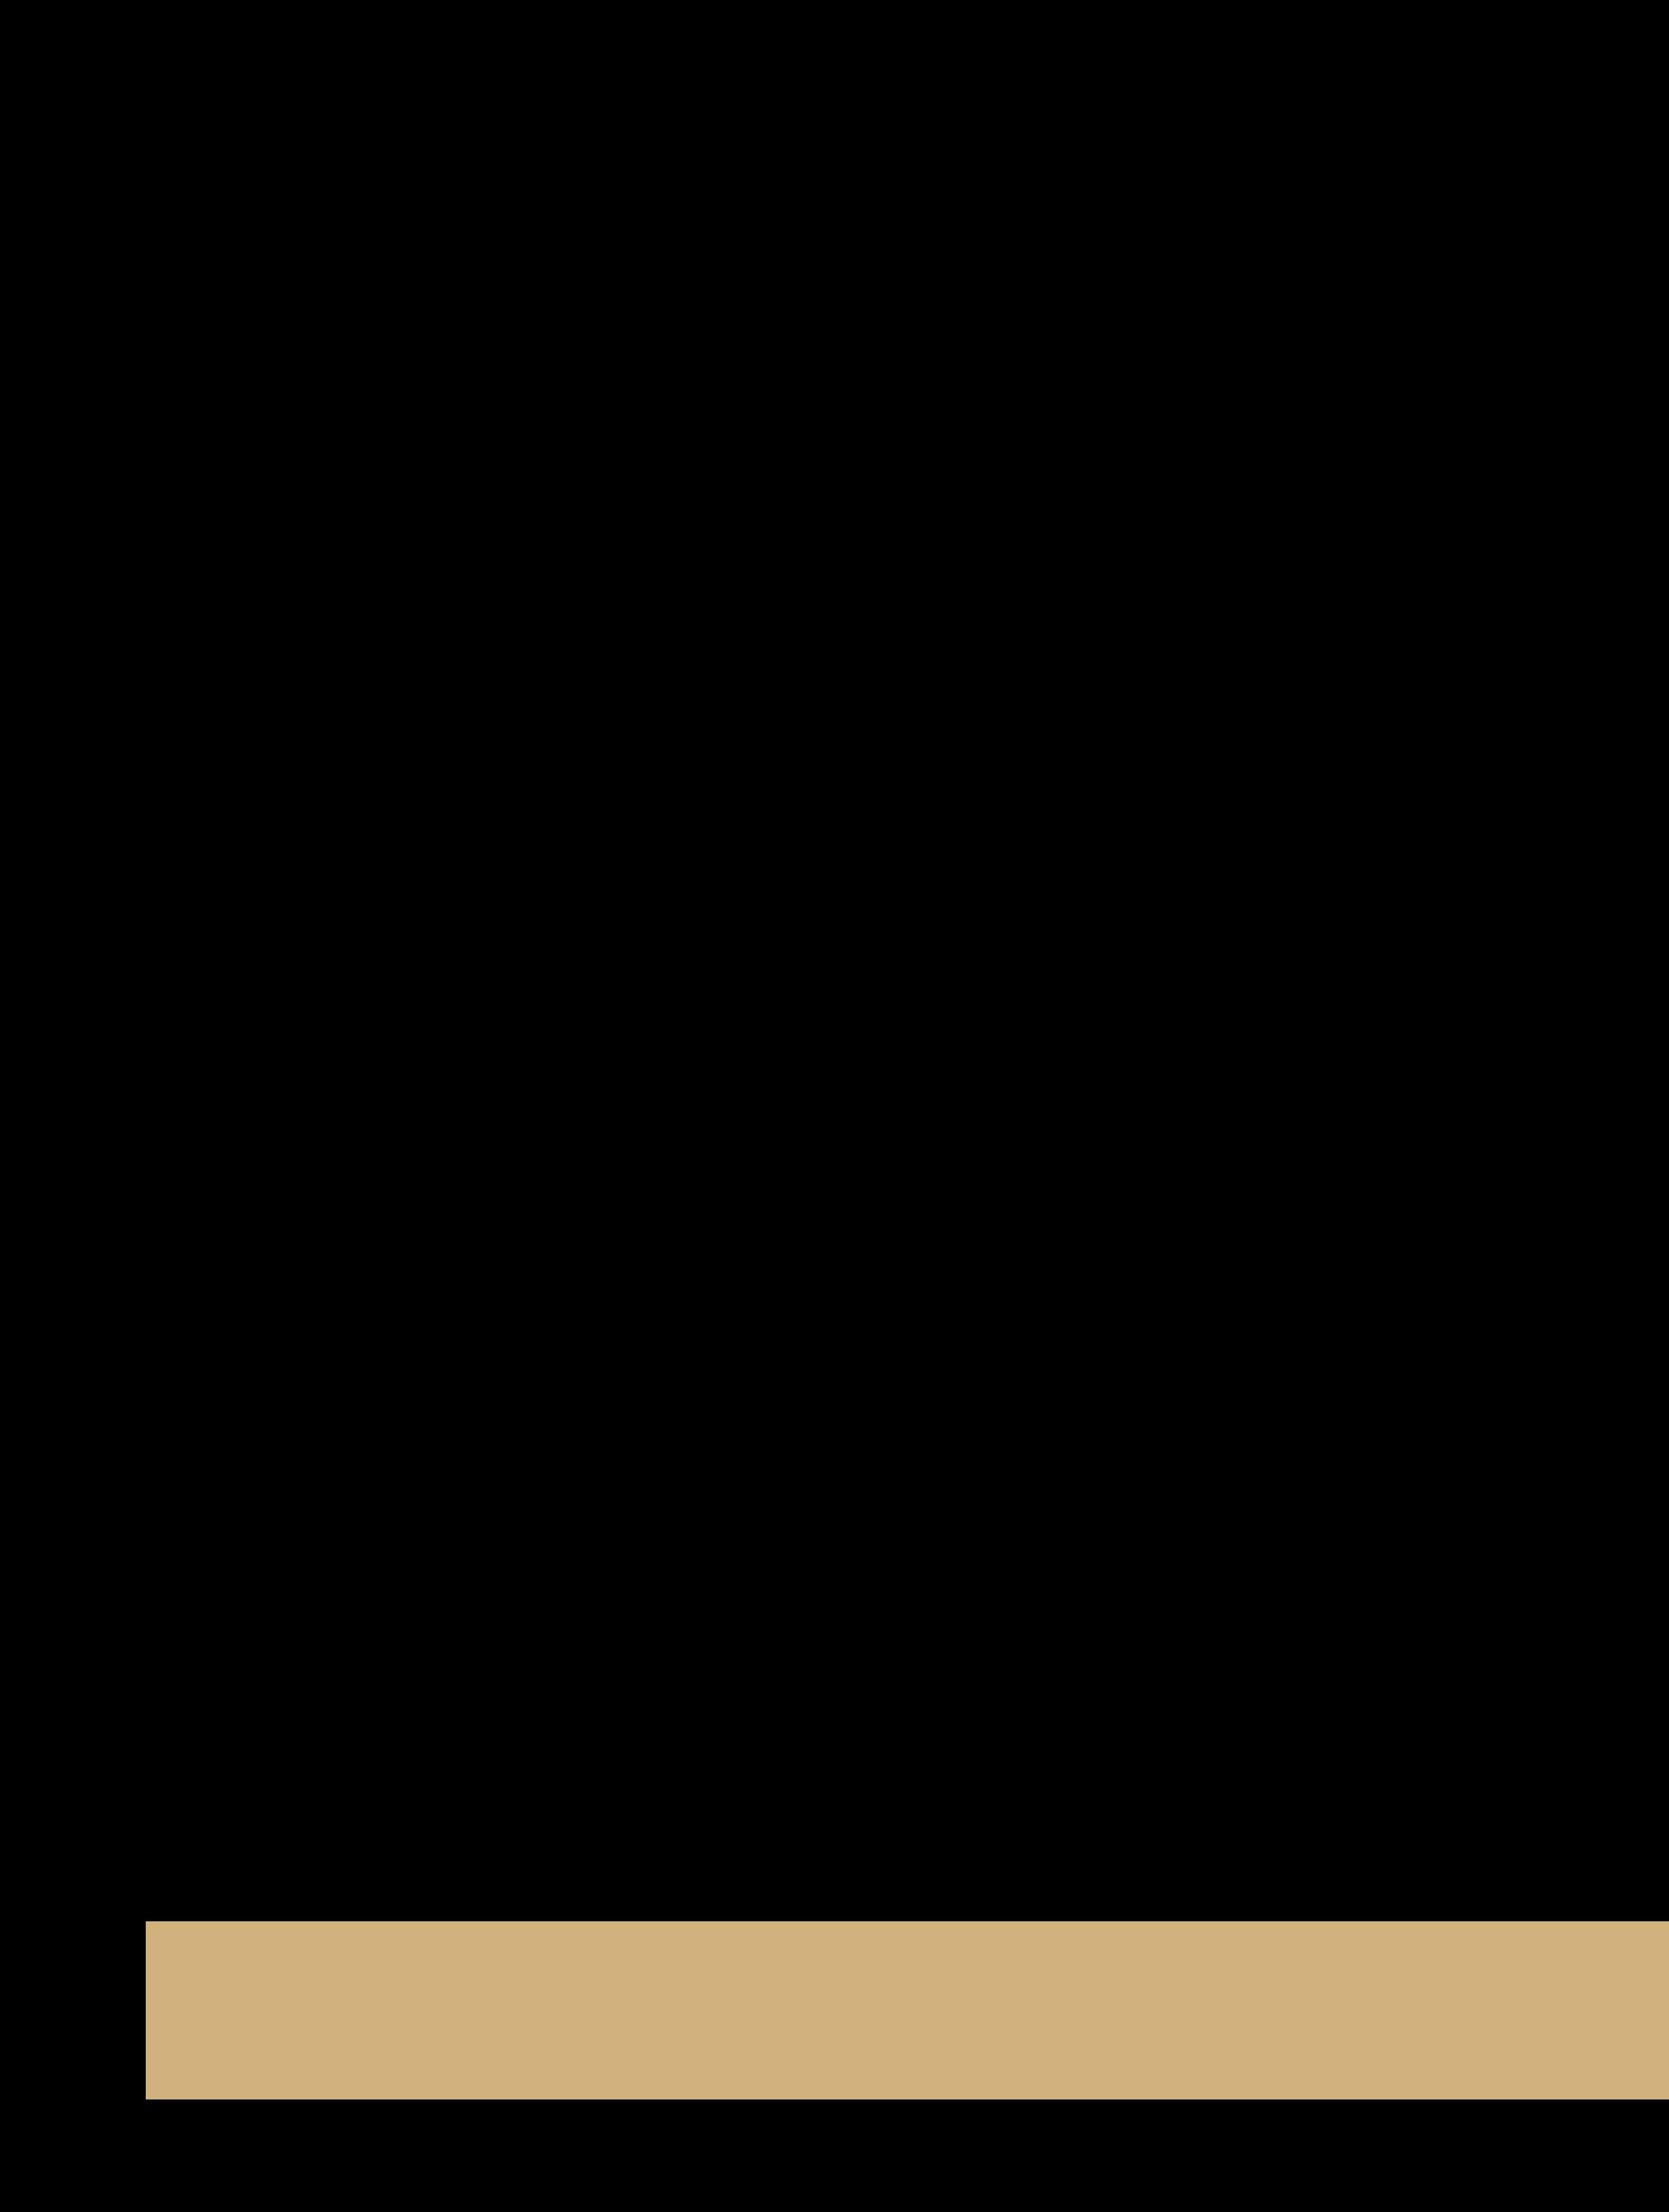 Ipad Vertical_2048x2732_Vines_Gold.png